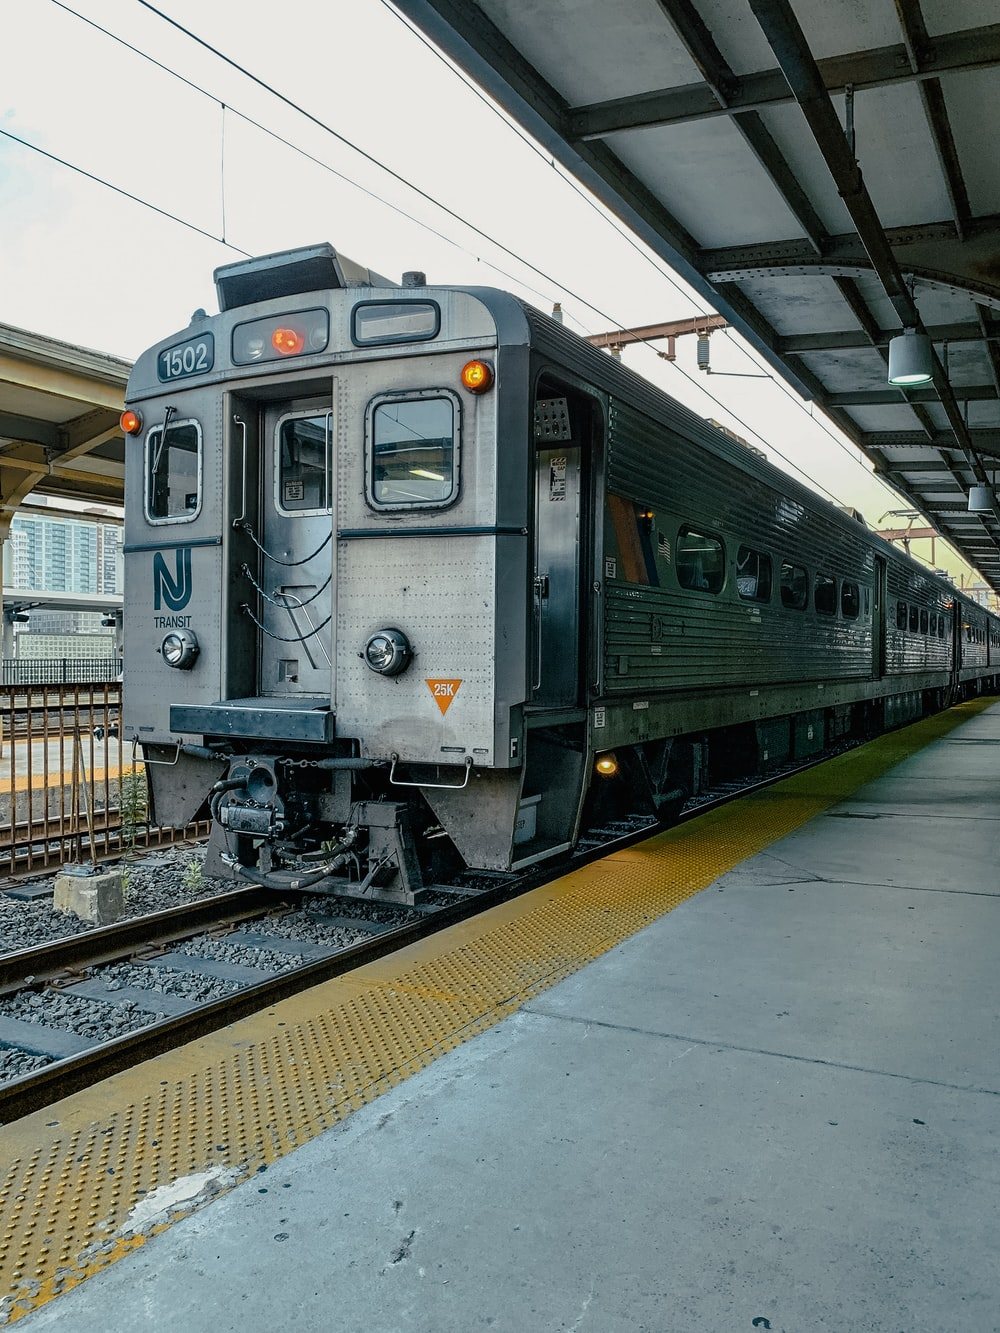 gray and black train